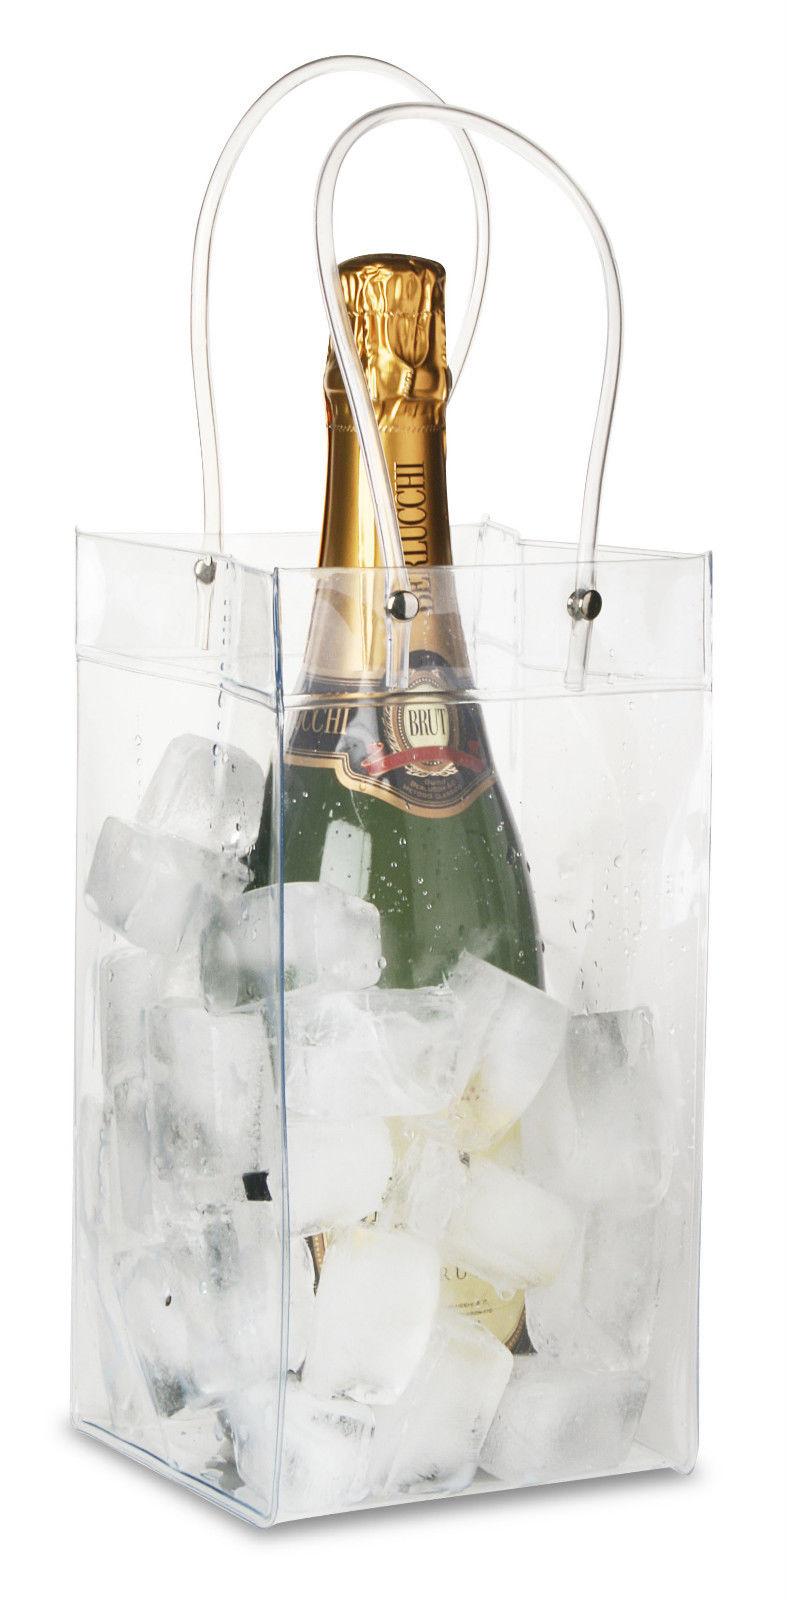 Stock 10 borse porta ghiaccio vino bottiglie porta ghiaccio borsa porta ghiaccio fiori a righe - Porta bottiglie ...